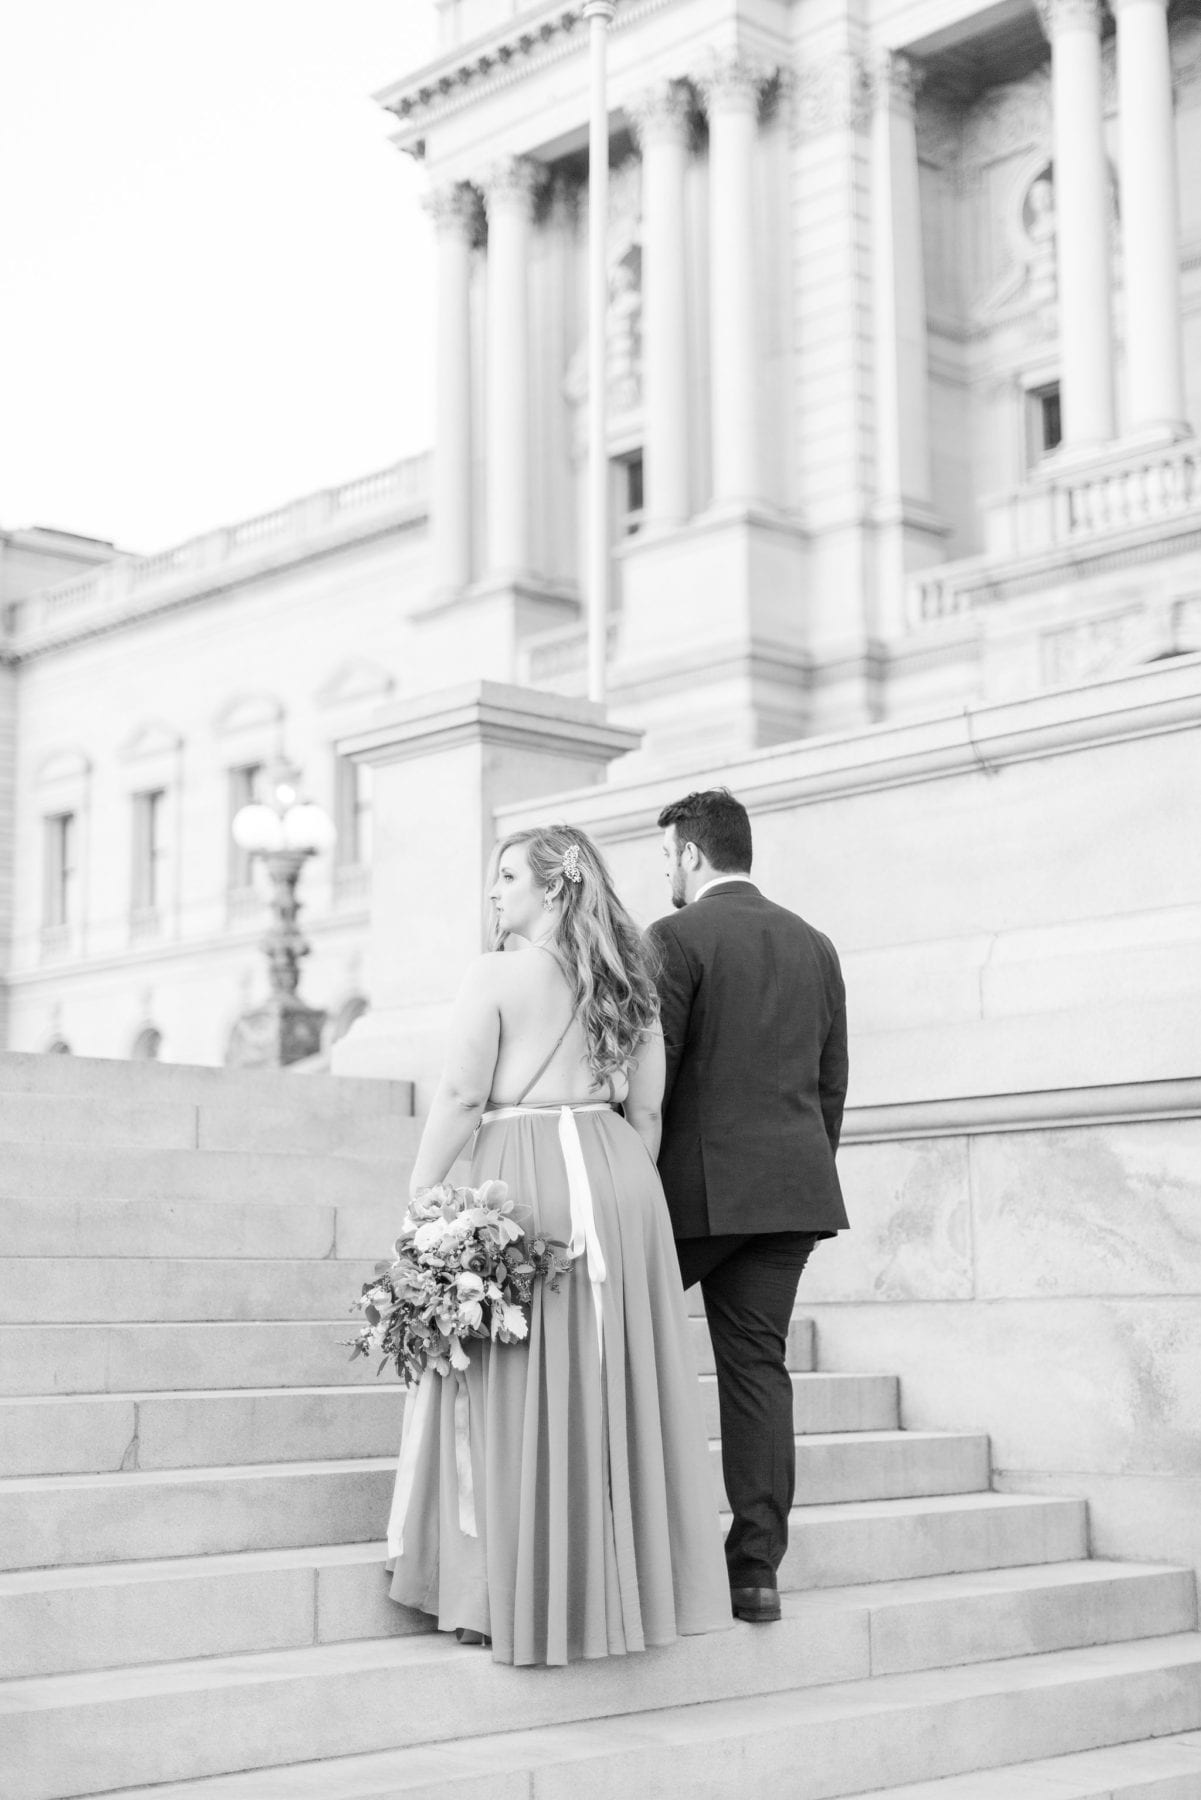 Capitol Hill Engagement Photos Kelly & Zach Washington DC Wedding Photographer Megan Kelsey Photography-325.jpg